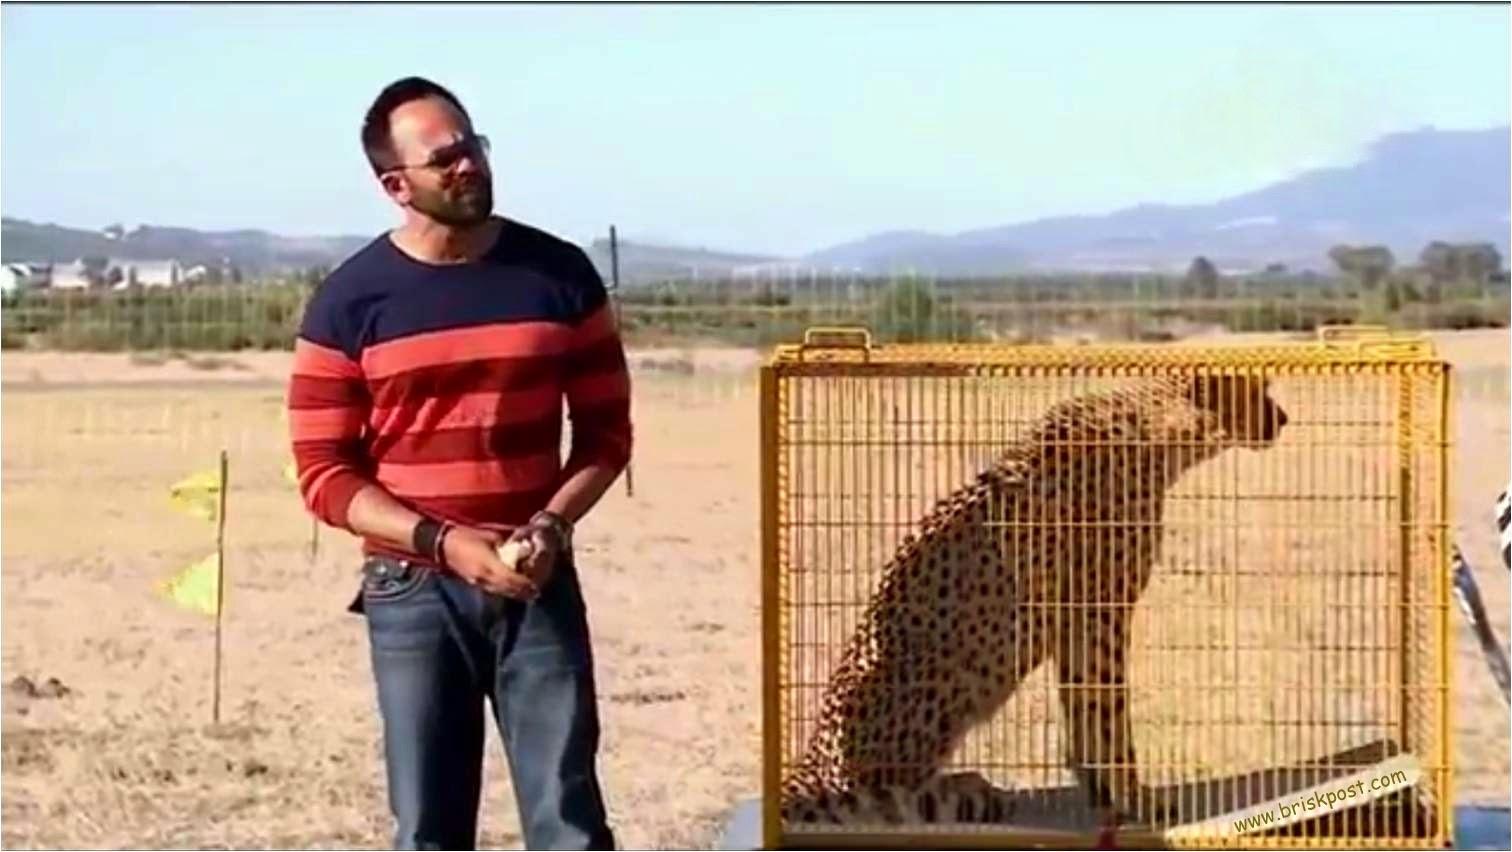 Rohit Shetty with tiget in cage at Khatron Ke Khiladi show